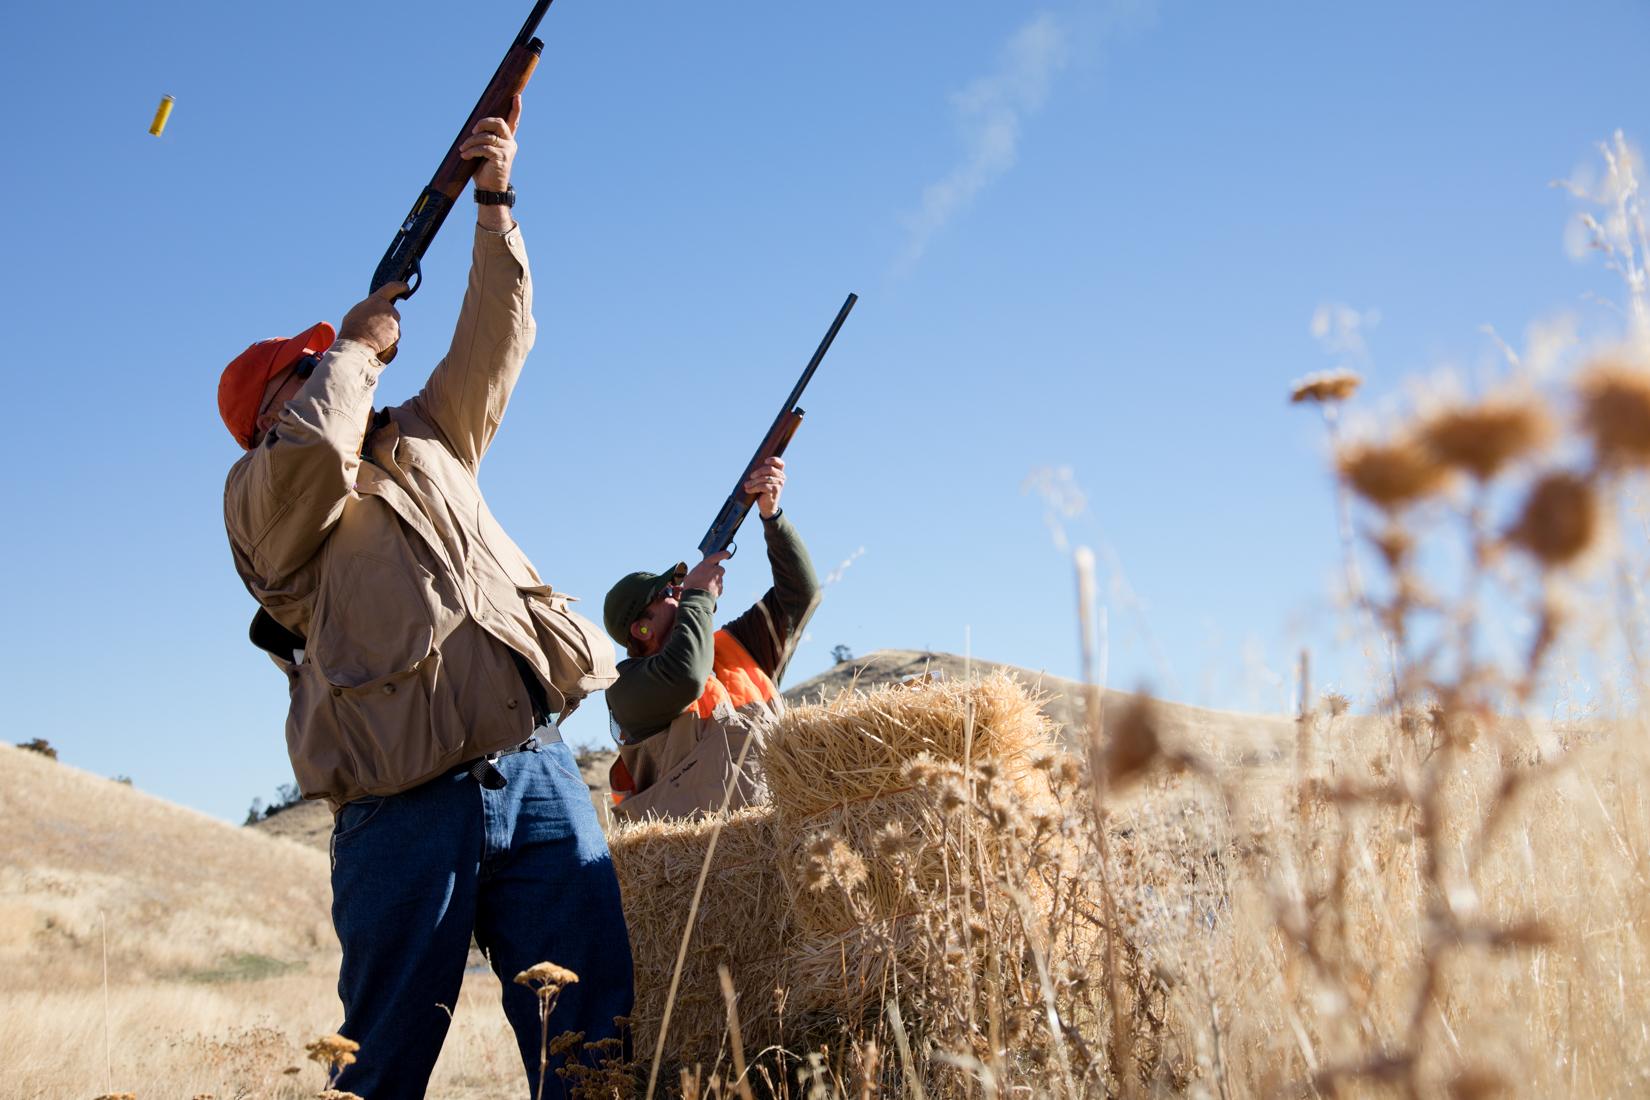 Hunters shooting Pheasants